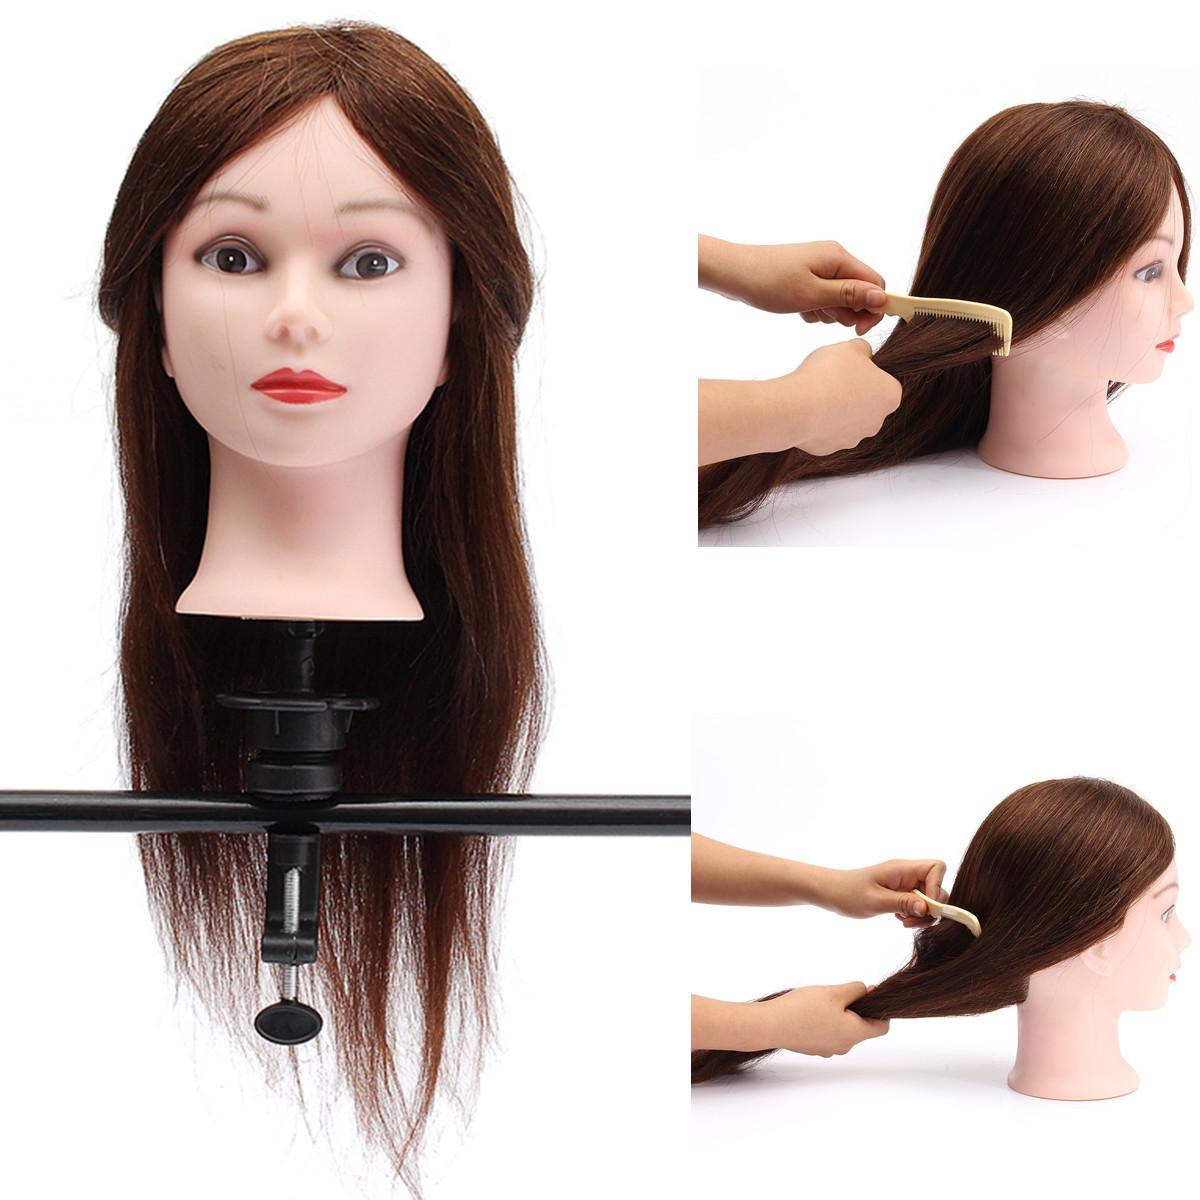 Salon real human hair salon hairdressing training head for Actual beauty salon